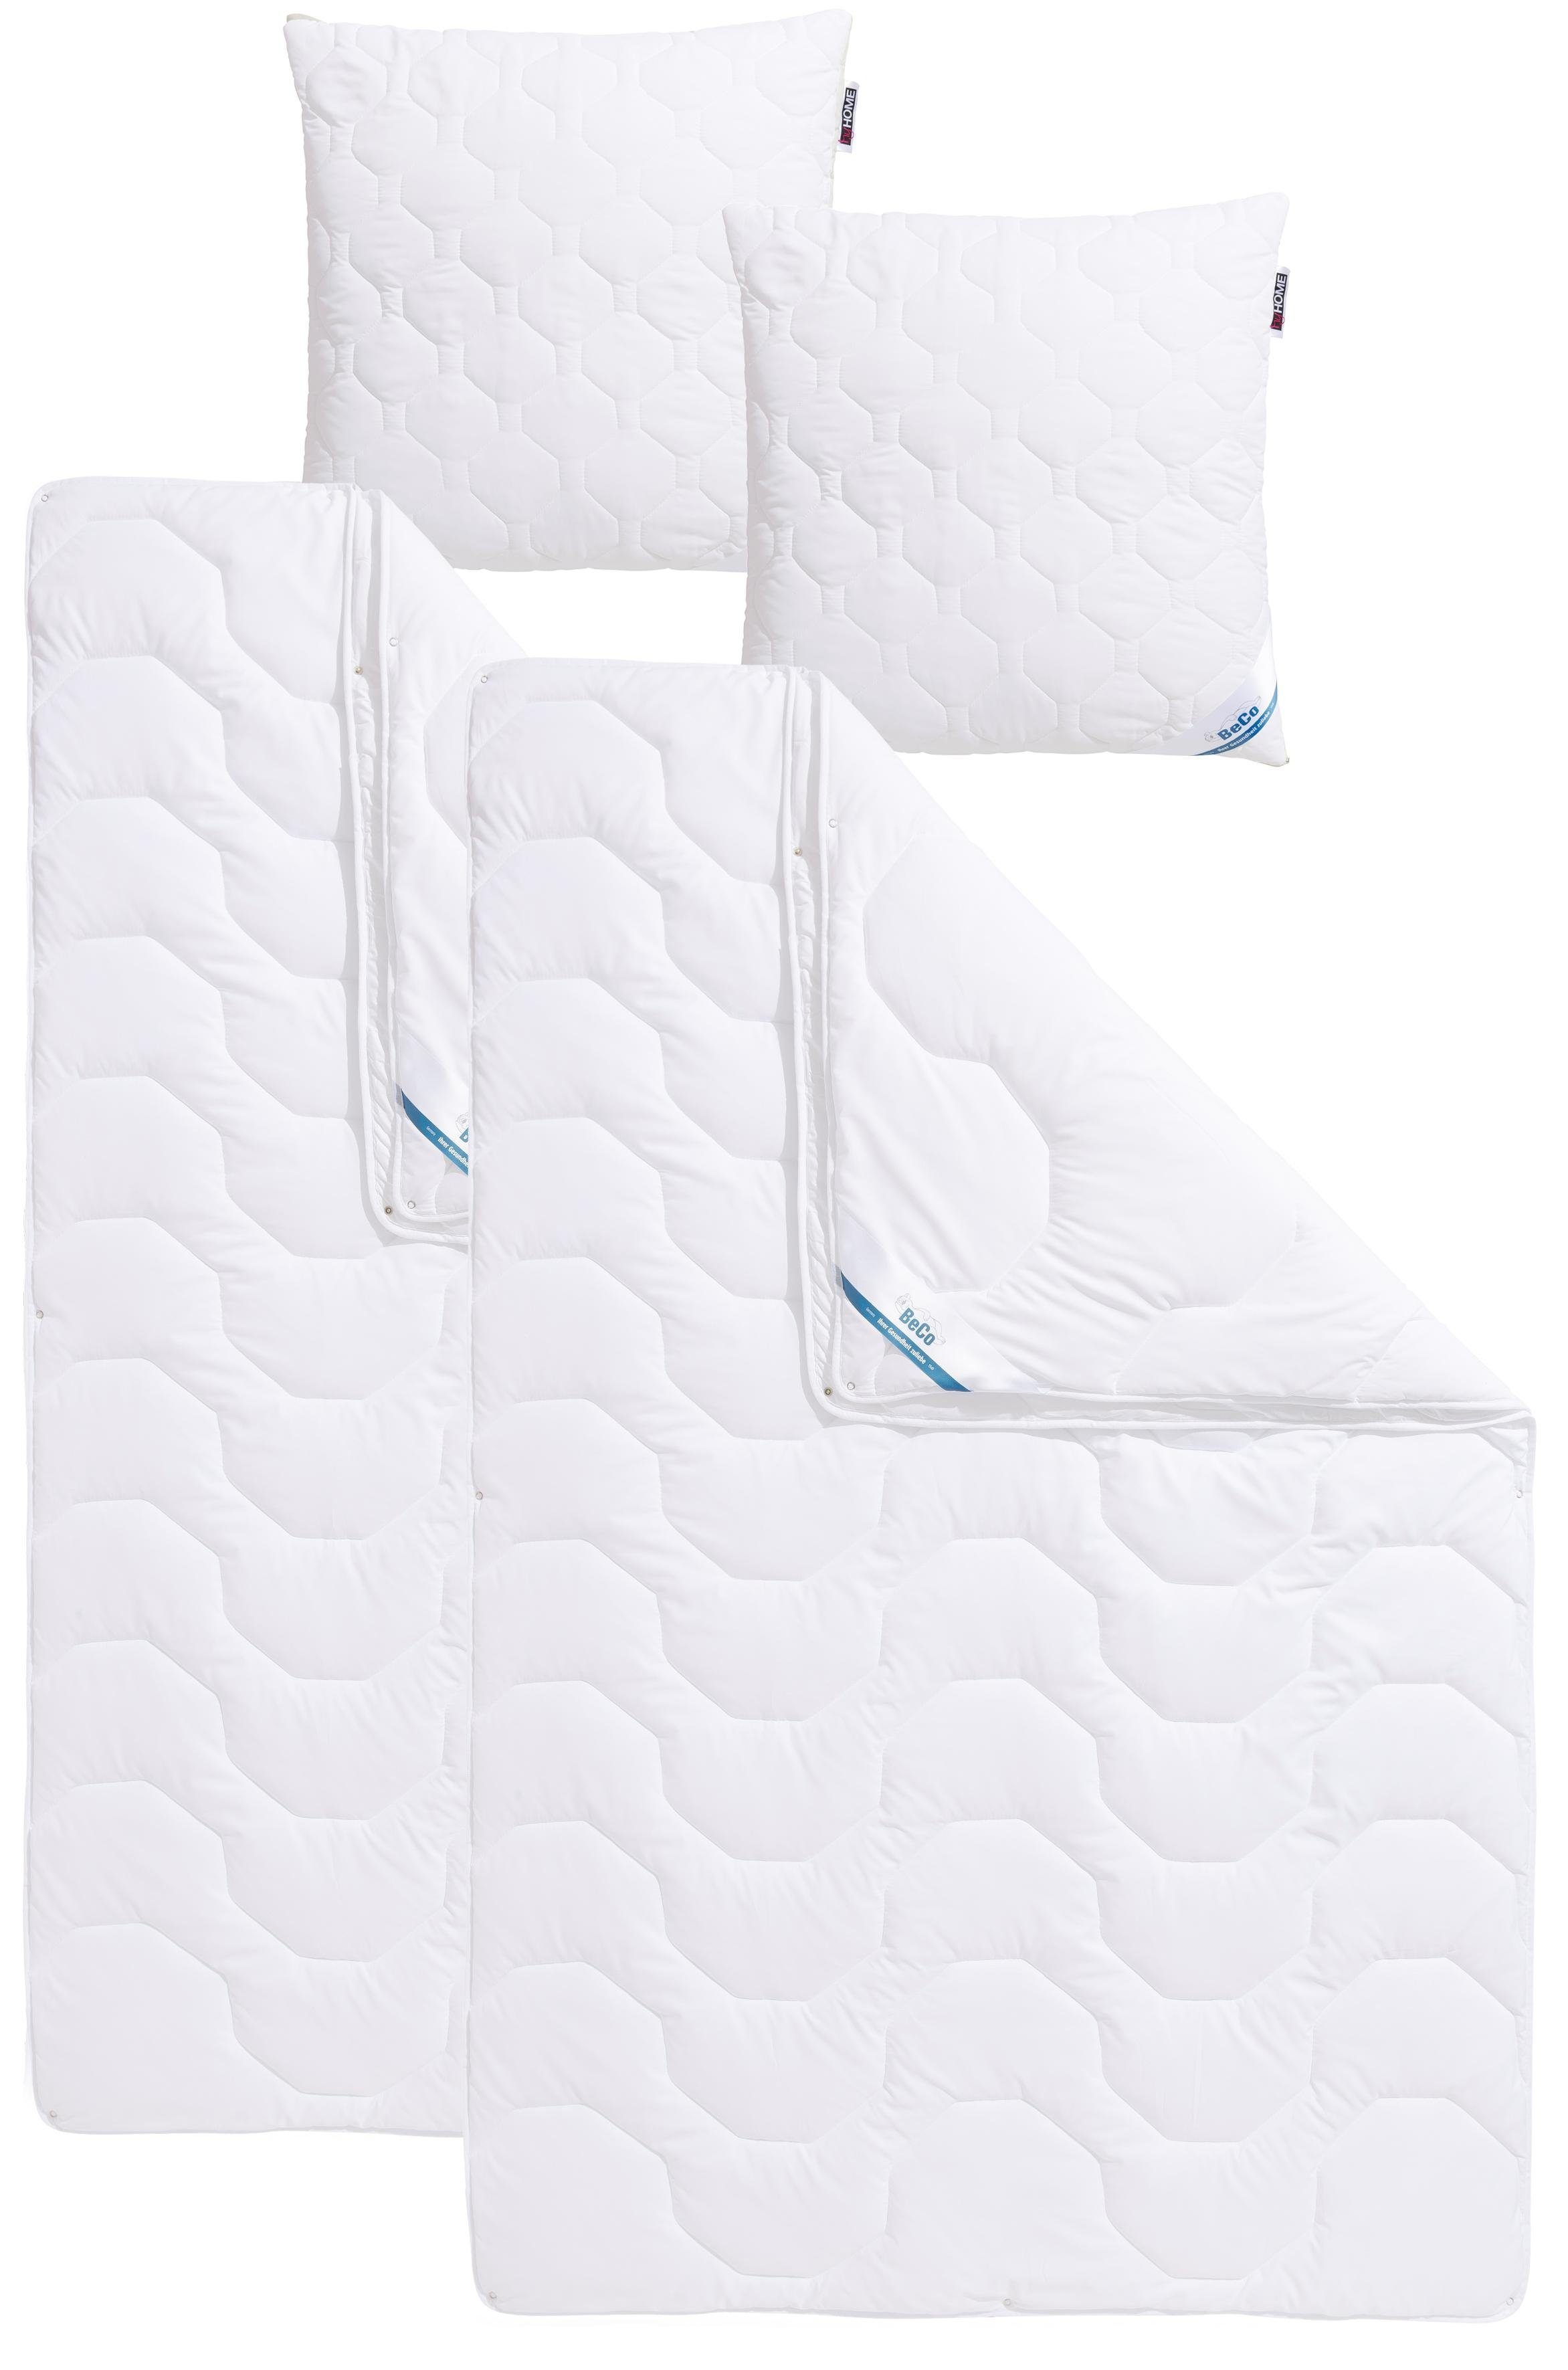 Set: Kunstfaserbettdecken + Kopfkissen, »Antibac«, BeCo, 4-Jahreszeiten - antibakteriell, Füllung: 100% Polyester, Bezug: 100% Polyester, kochfest 95°